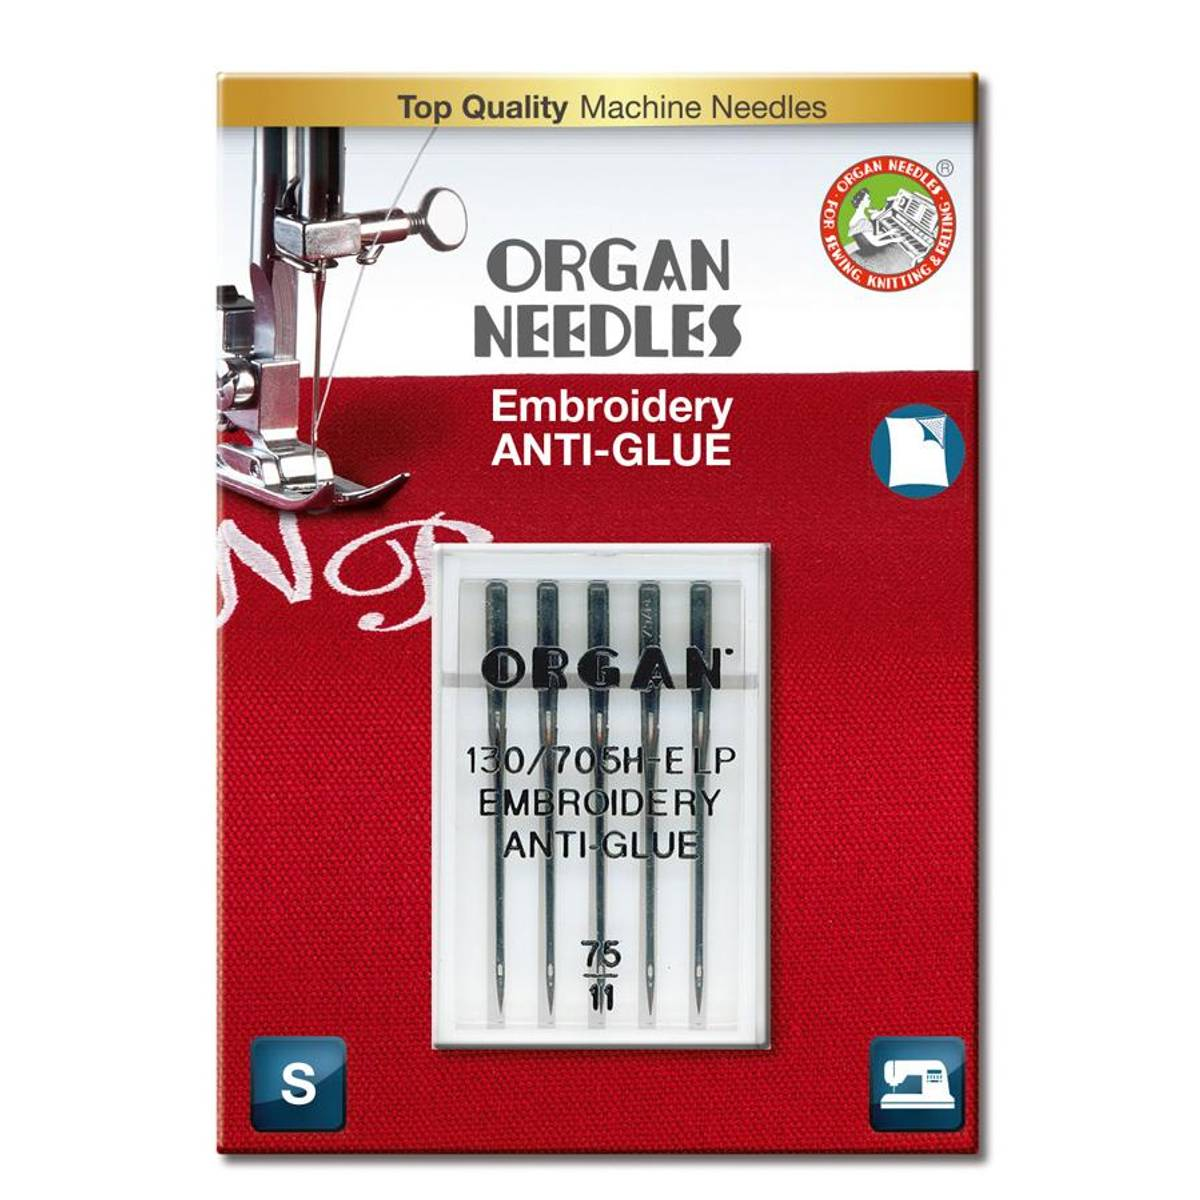 Organ broderinål ANTI-GLUE 75